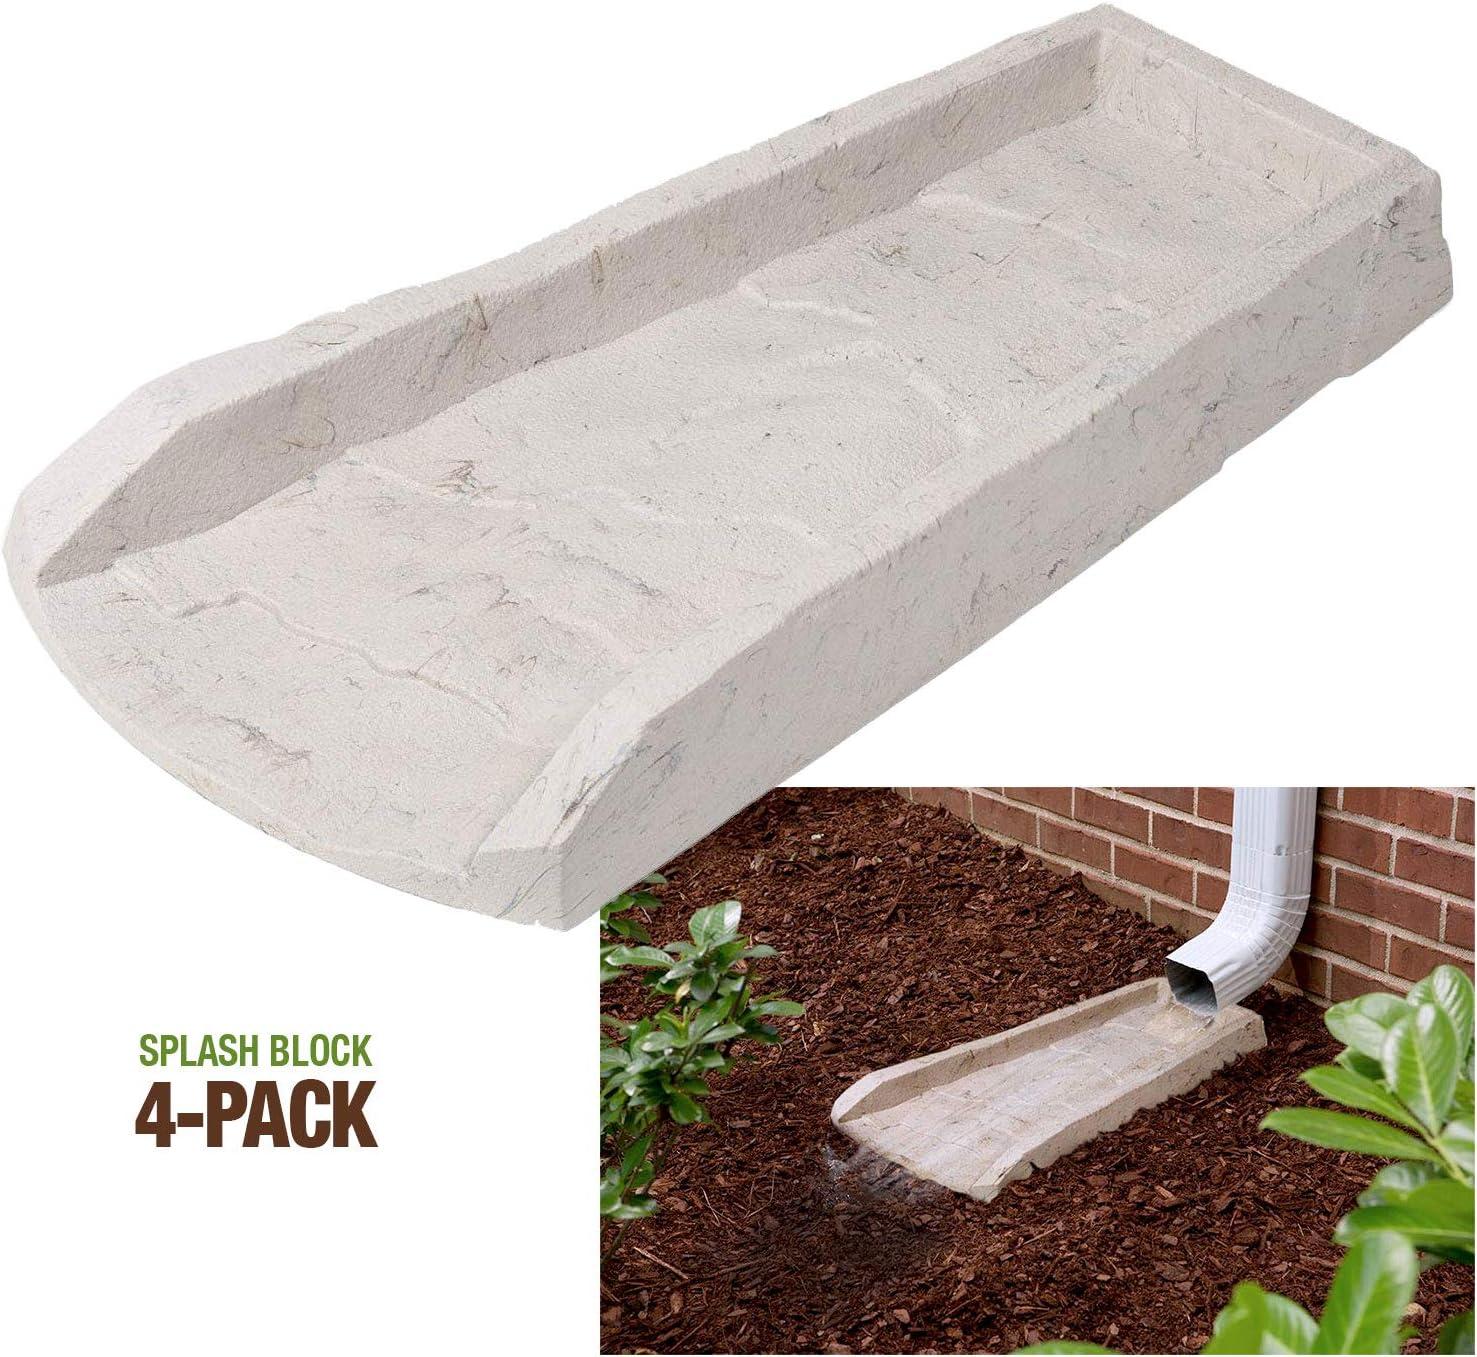 2-Pack Decorative Downspout Natural Stone Texture Splash Block Rain Gutter Drain Extender